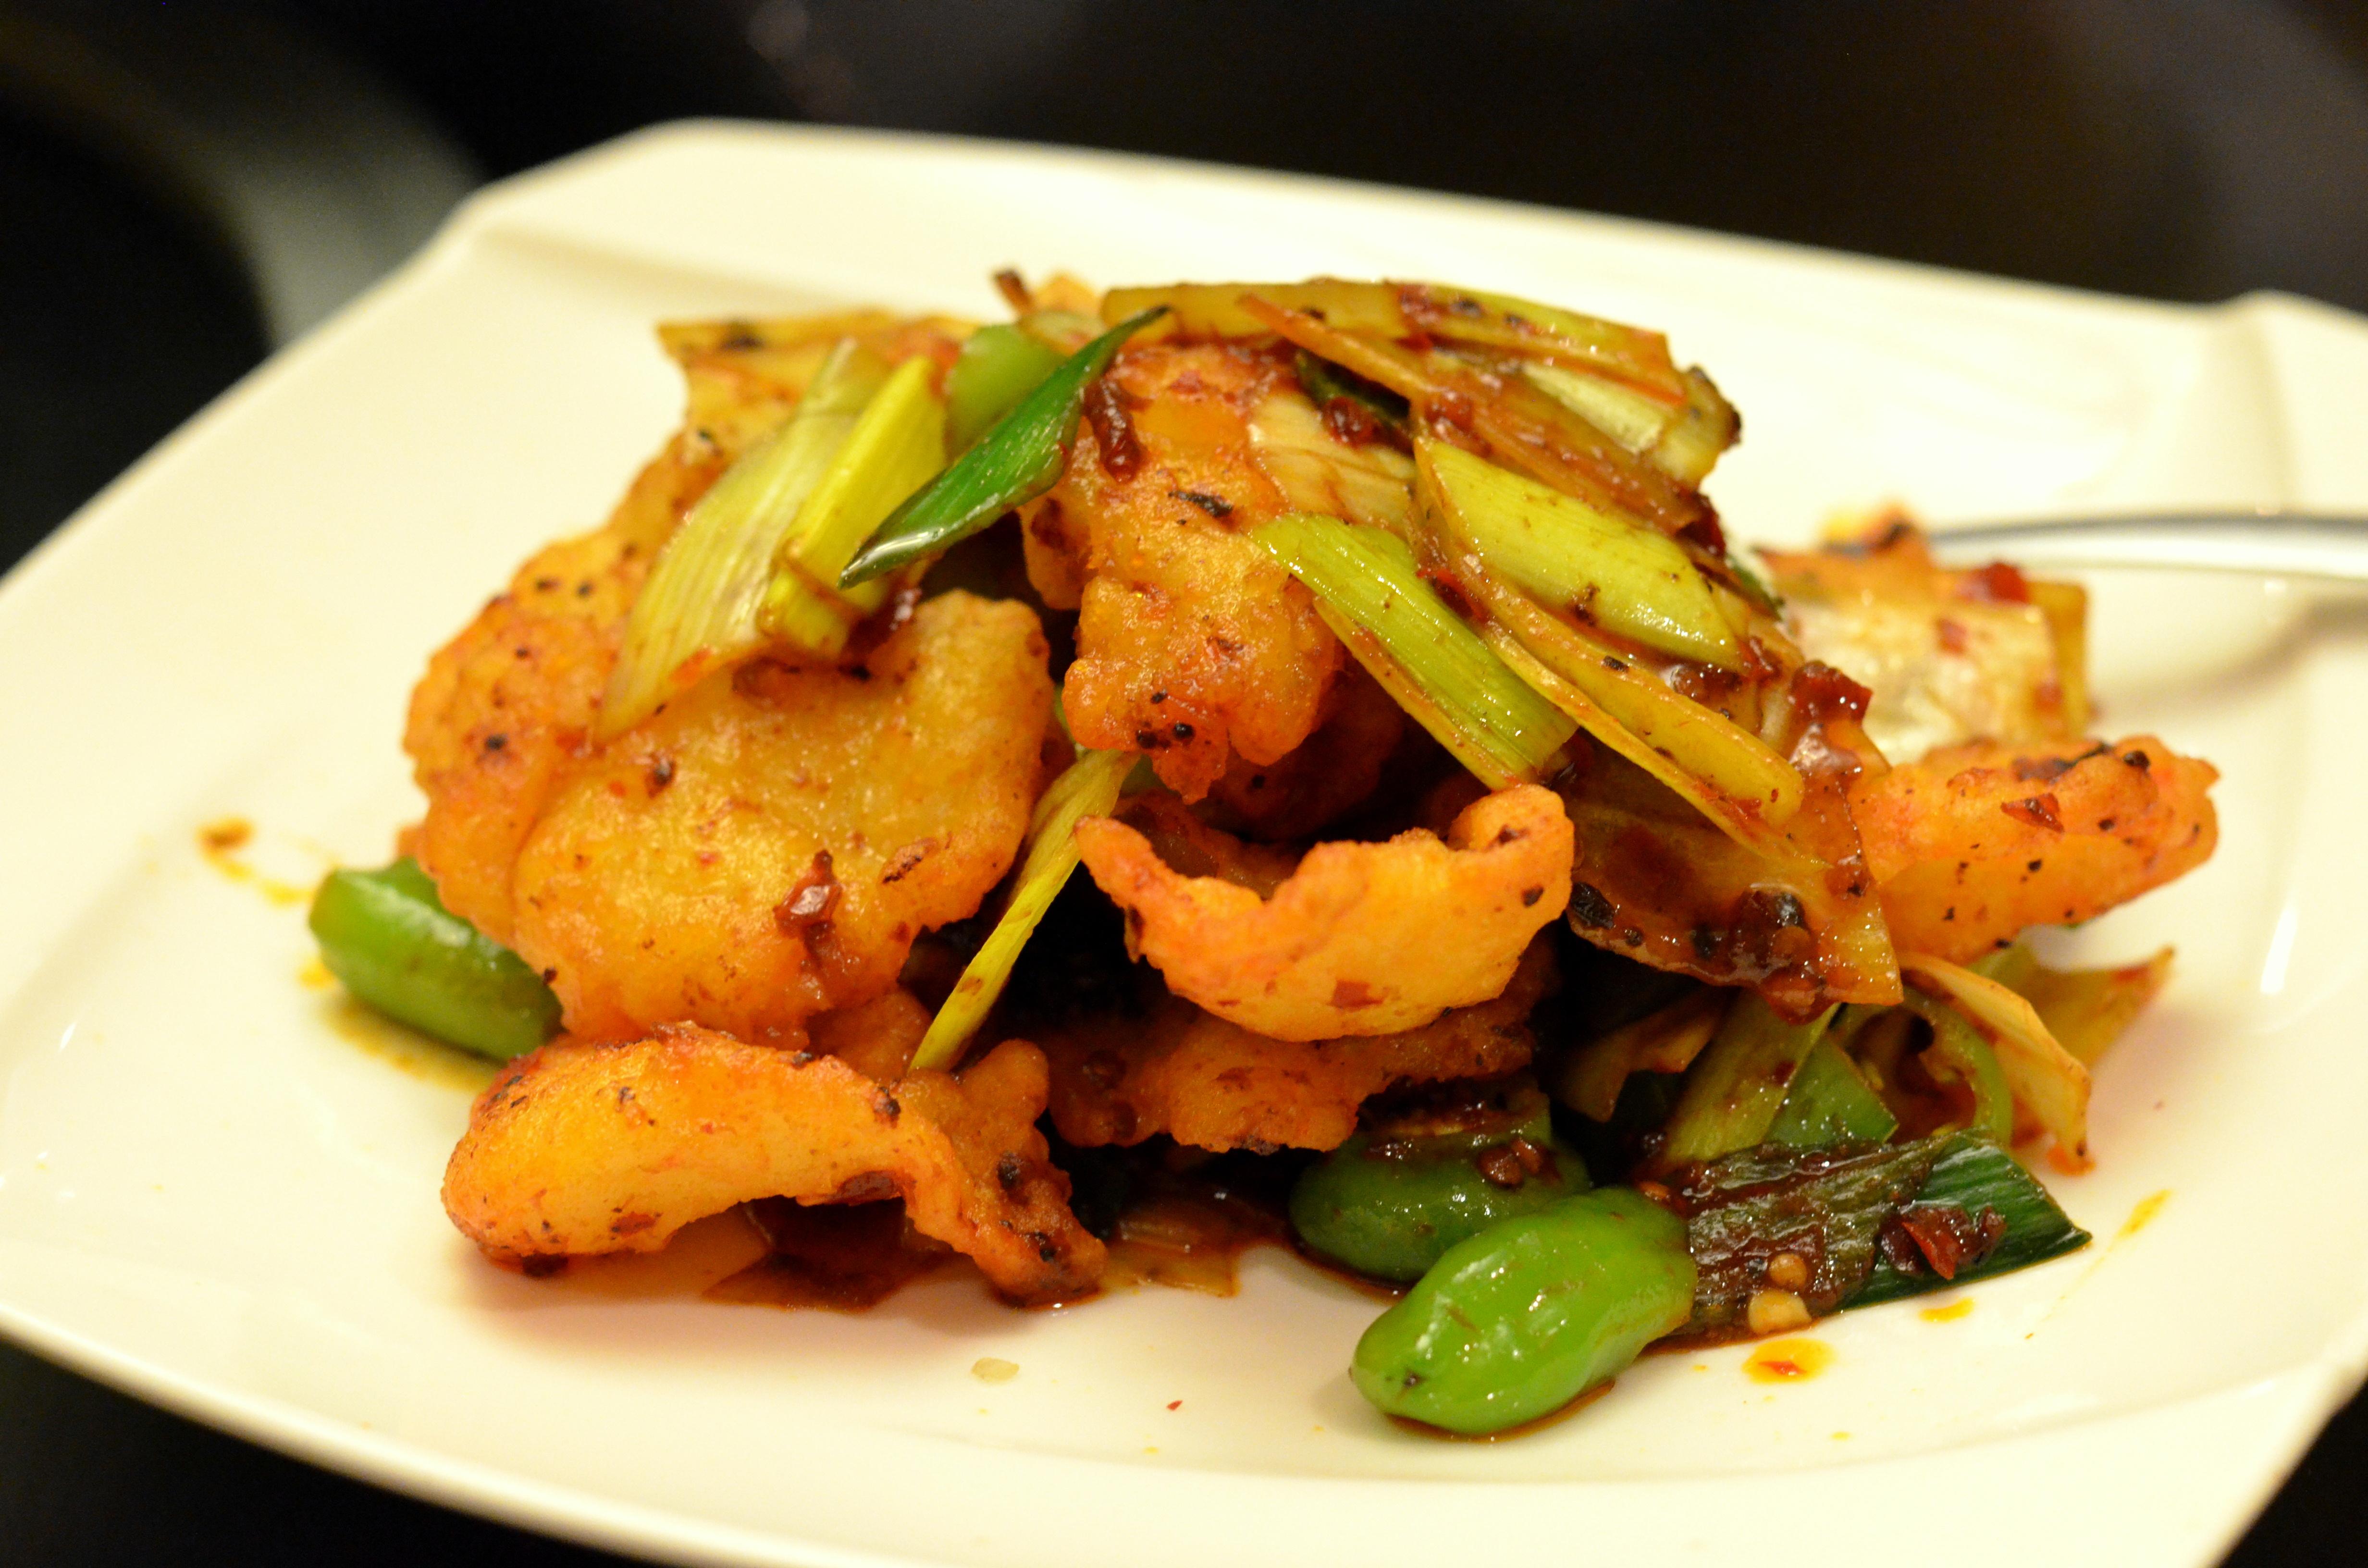 Tasting menu at han dynasty east village house of hao 39 s for Eastside fish fry menu